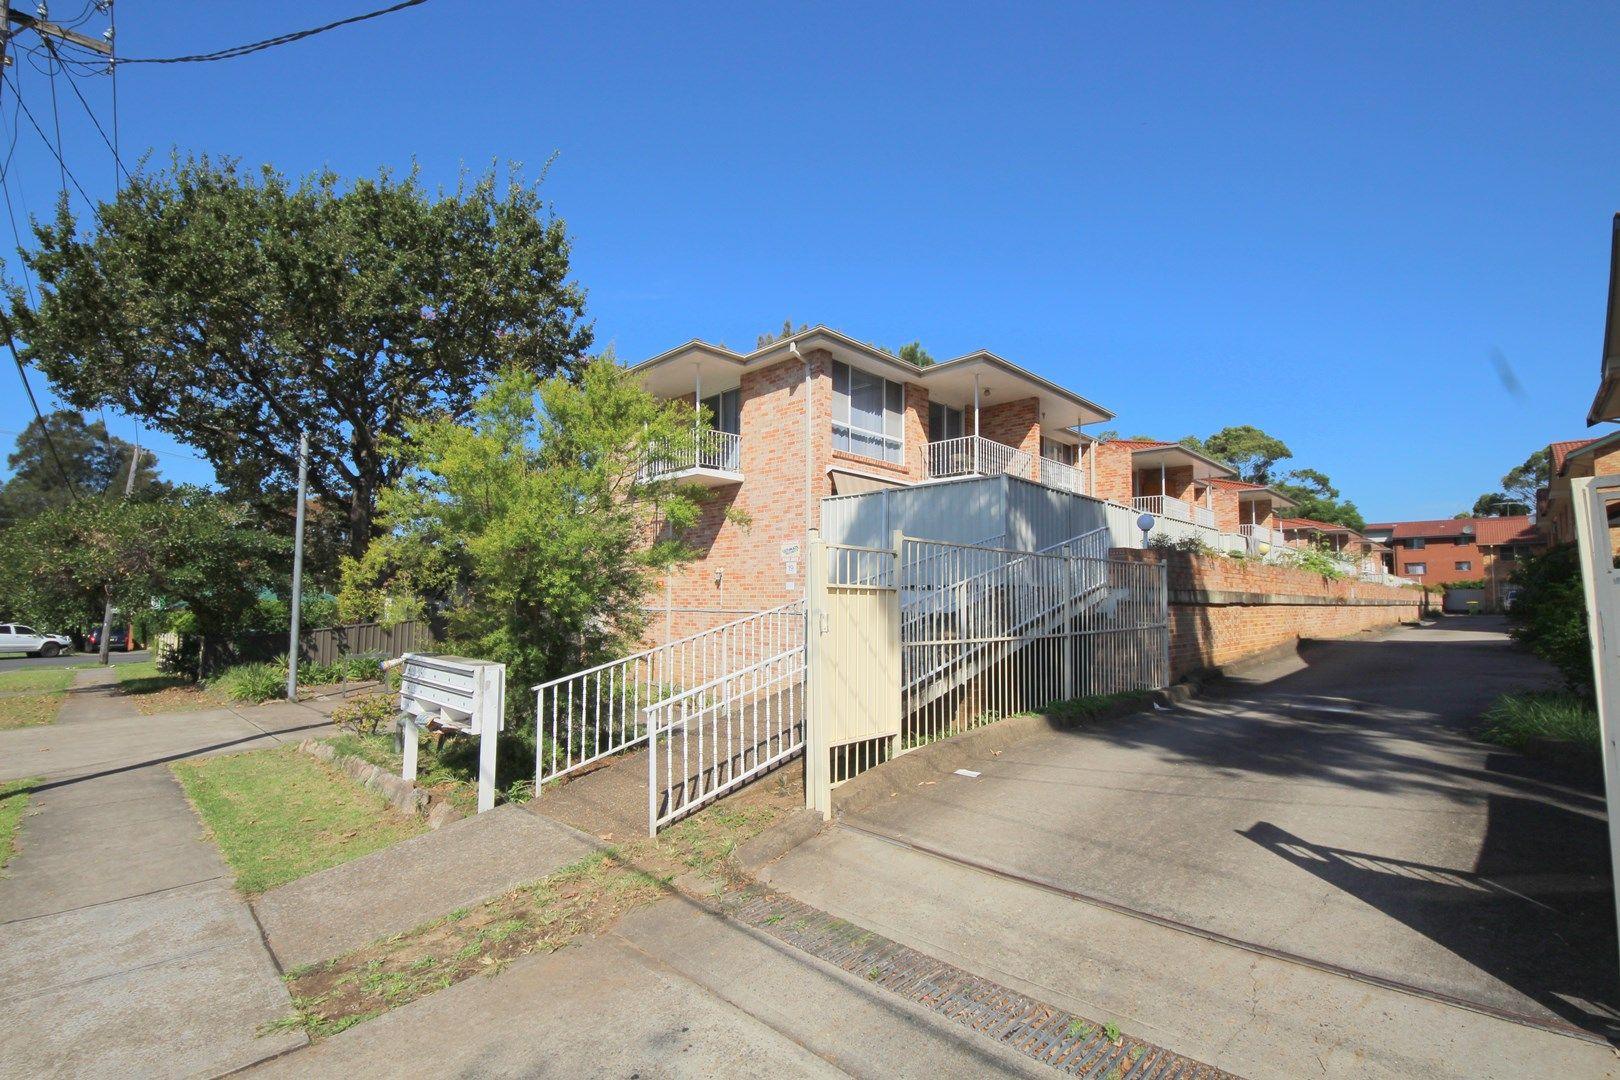 2/19 Dellwood Street, Bankstown NSW 2200, Image 0